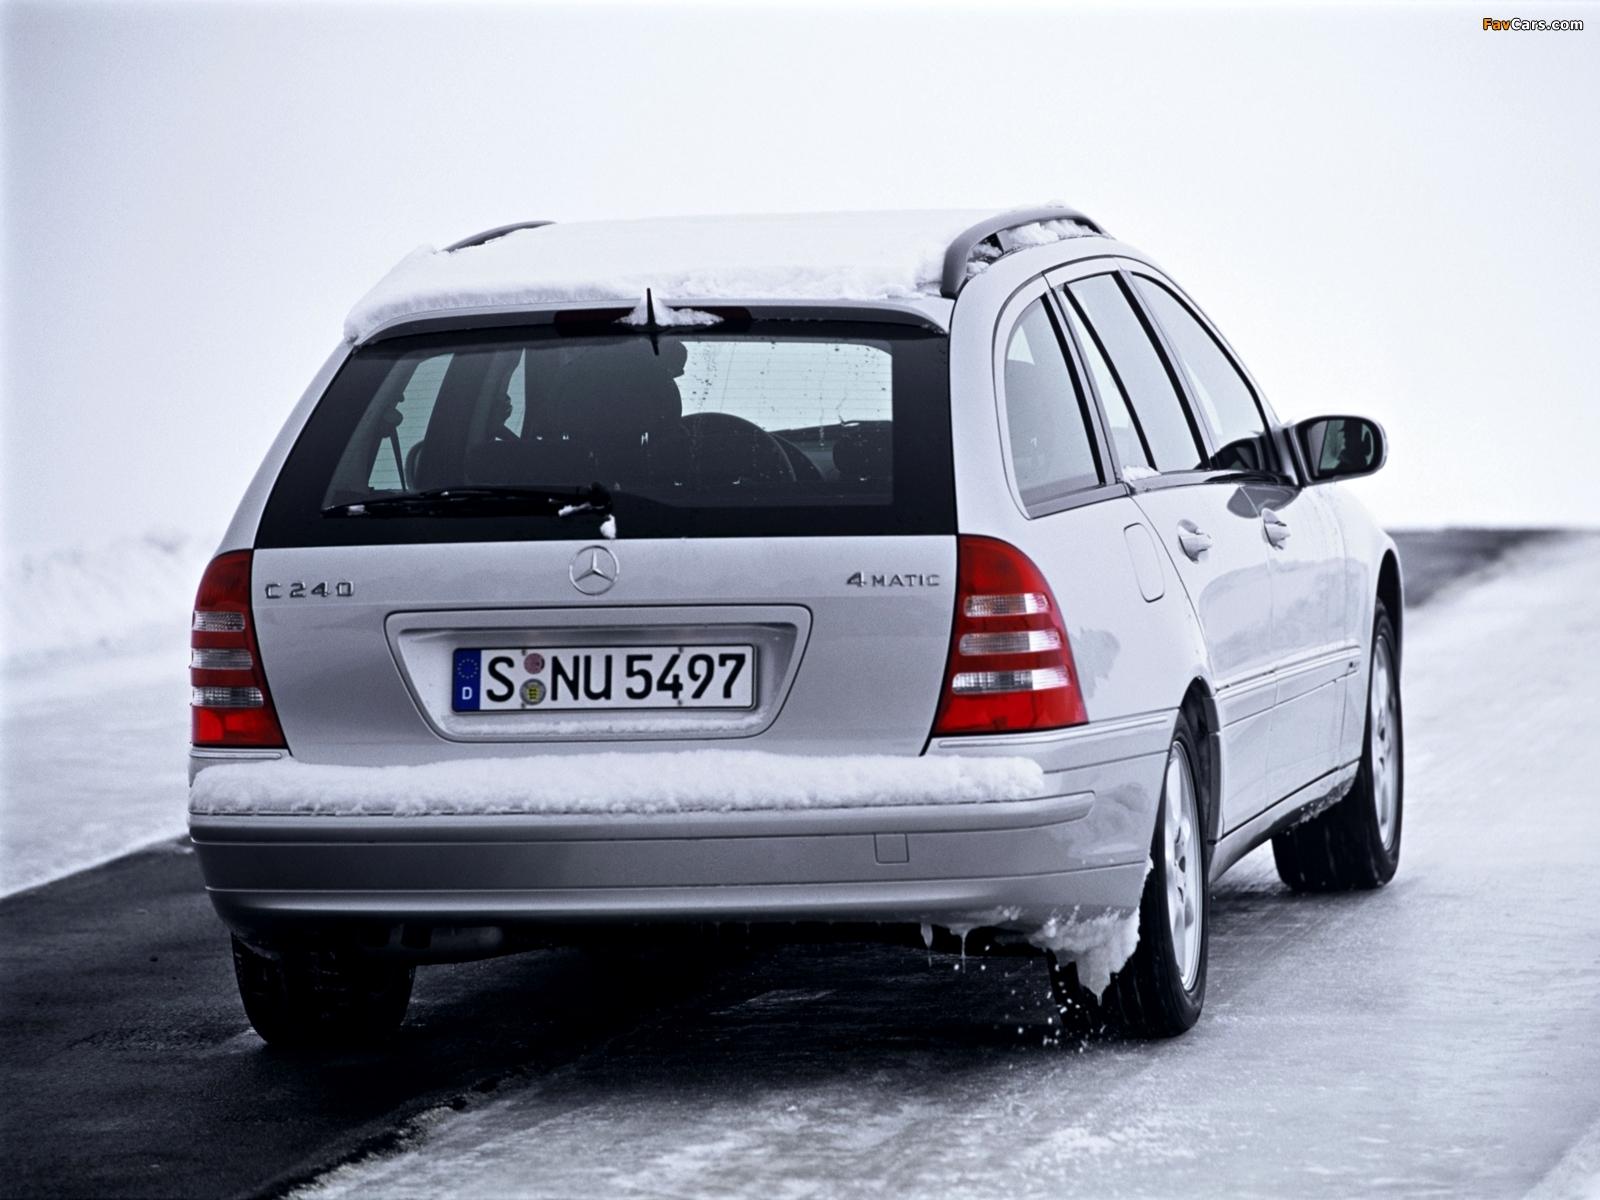 Images of mercedes benz c 240 estate s203 2001 05 for Mercedes benz c 240